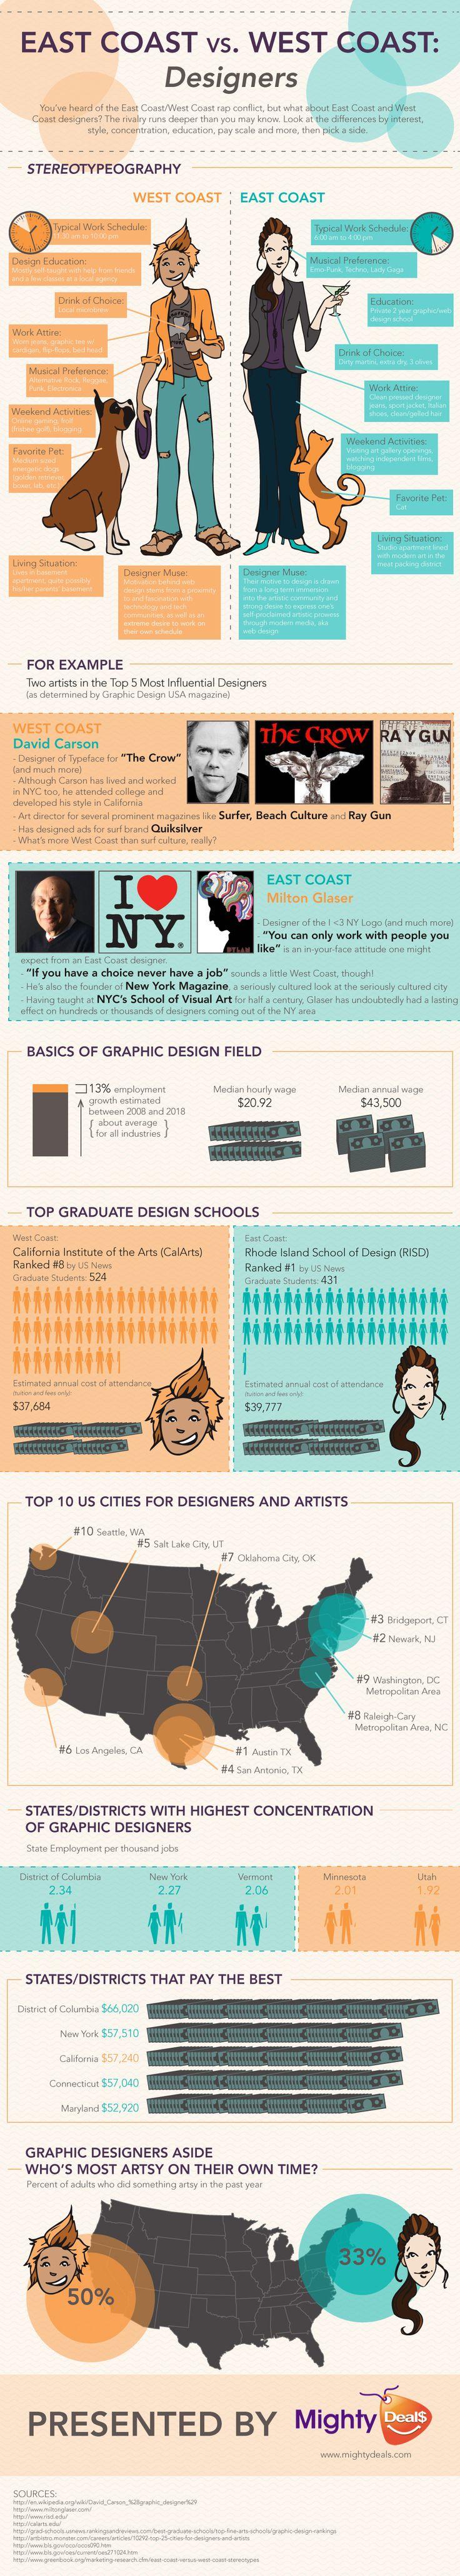 #Infographic: East coast vs west coast designersEast Coast, Design Infographic, Graphic Designers, Graphics Design, West Coast, Interesting Infographic, Infographic Mania, Westcoast, Coast Design